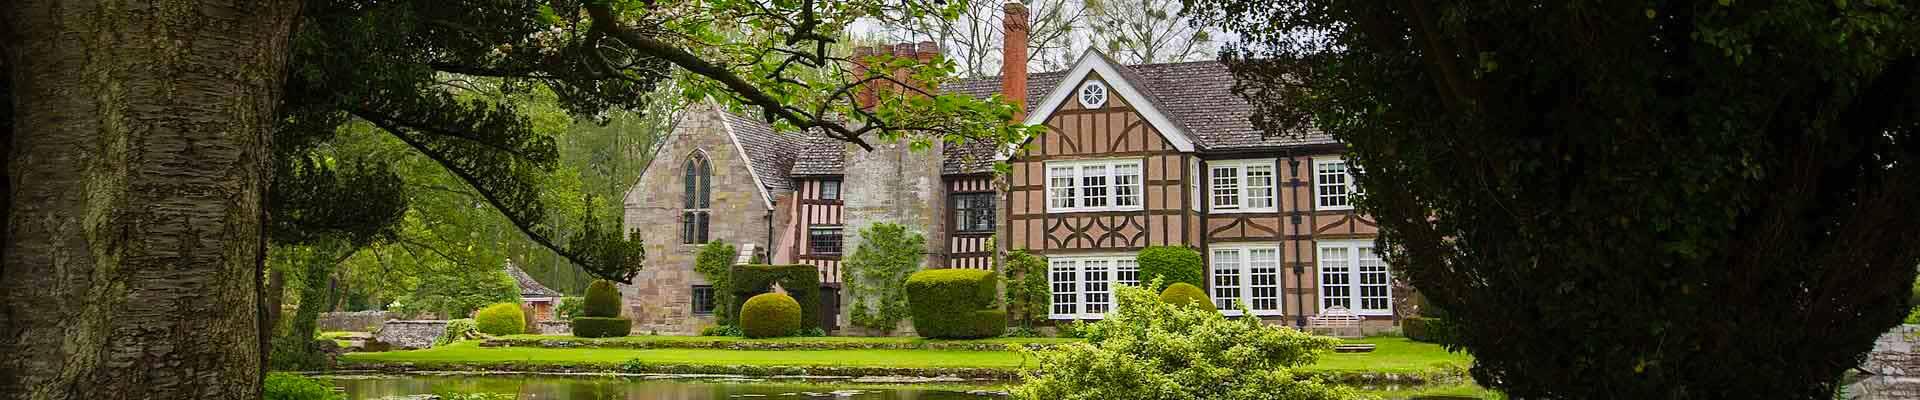 Photo of the impressive Ashridge House